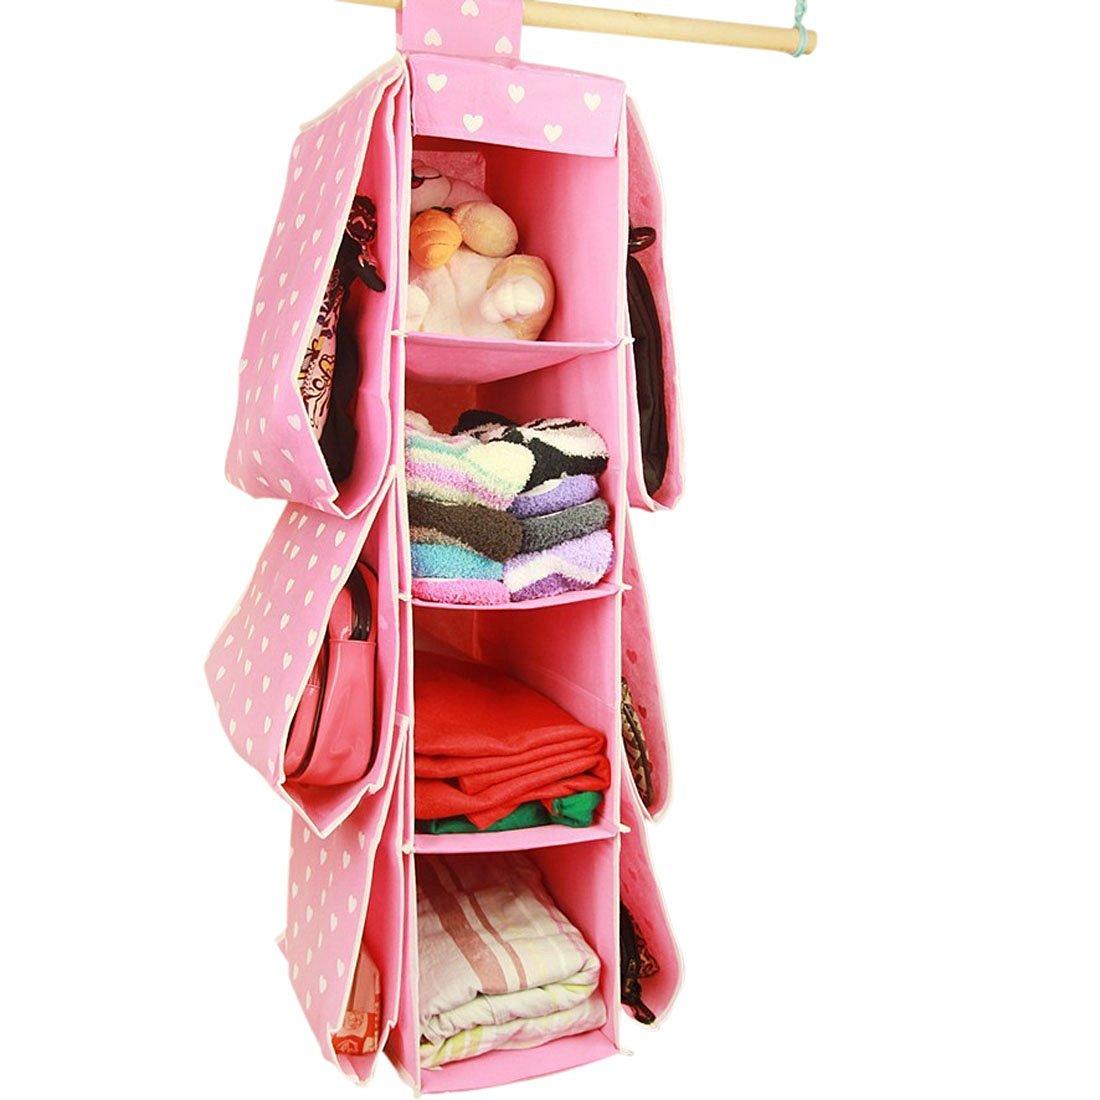 34224805fcc9 Cheap Door Handbags, find Door Handbags deals on line at Alibaba.com